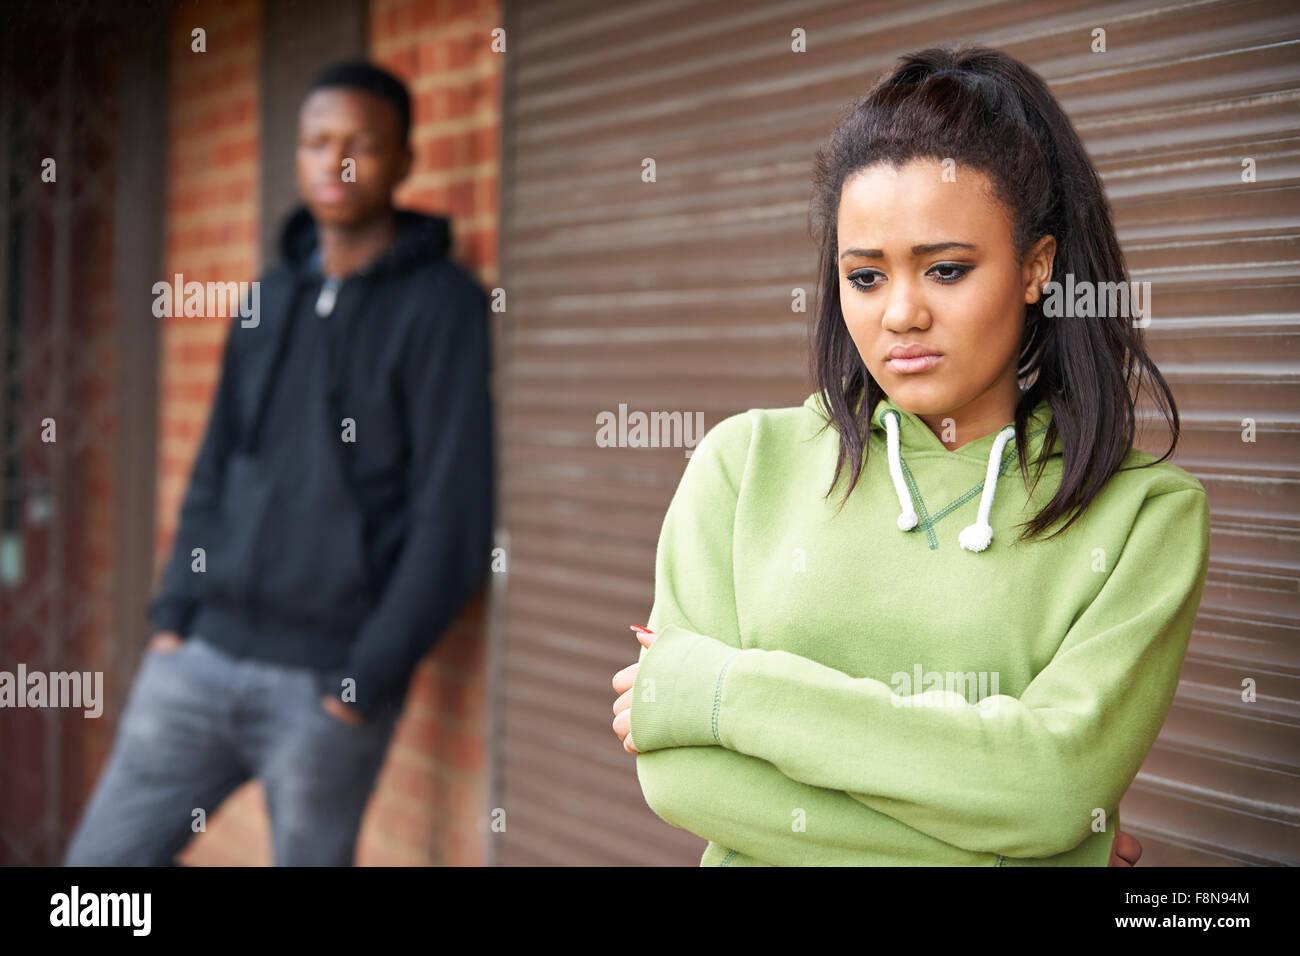 Portrait of Teenage Couple malheureux en milieu urbain Photo Stock